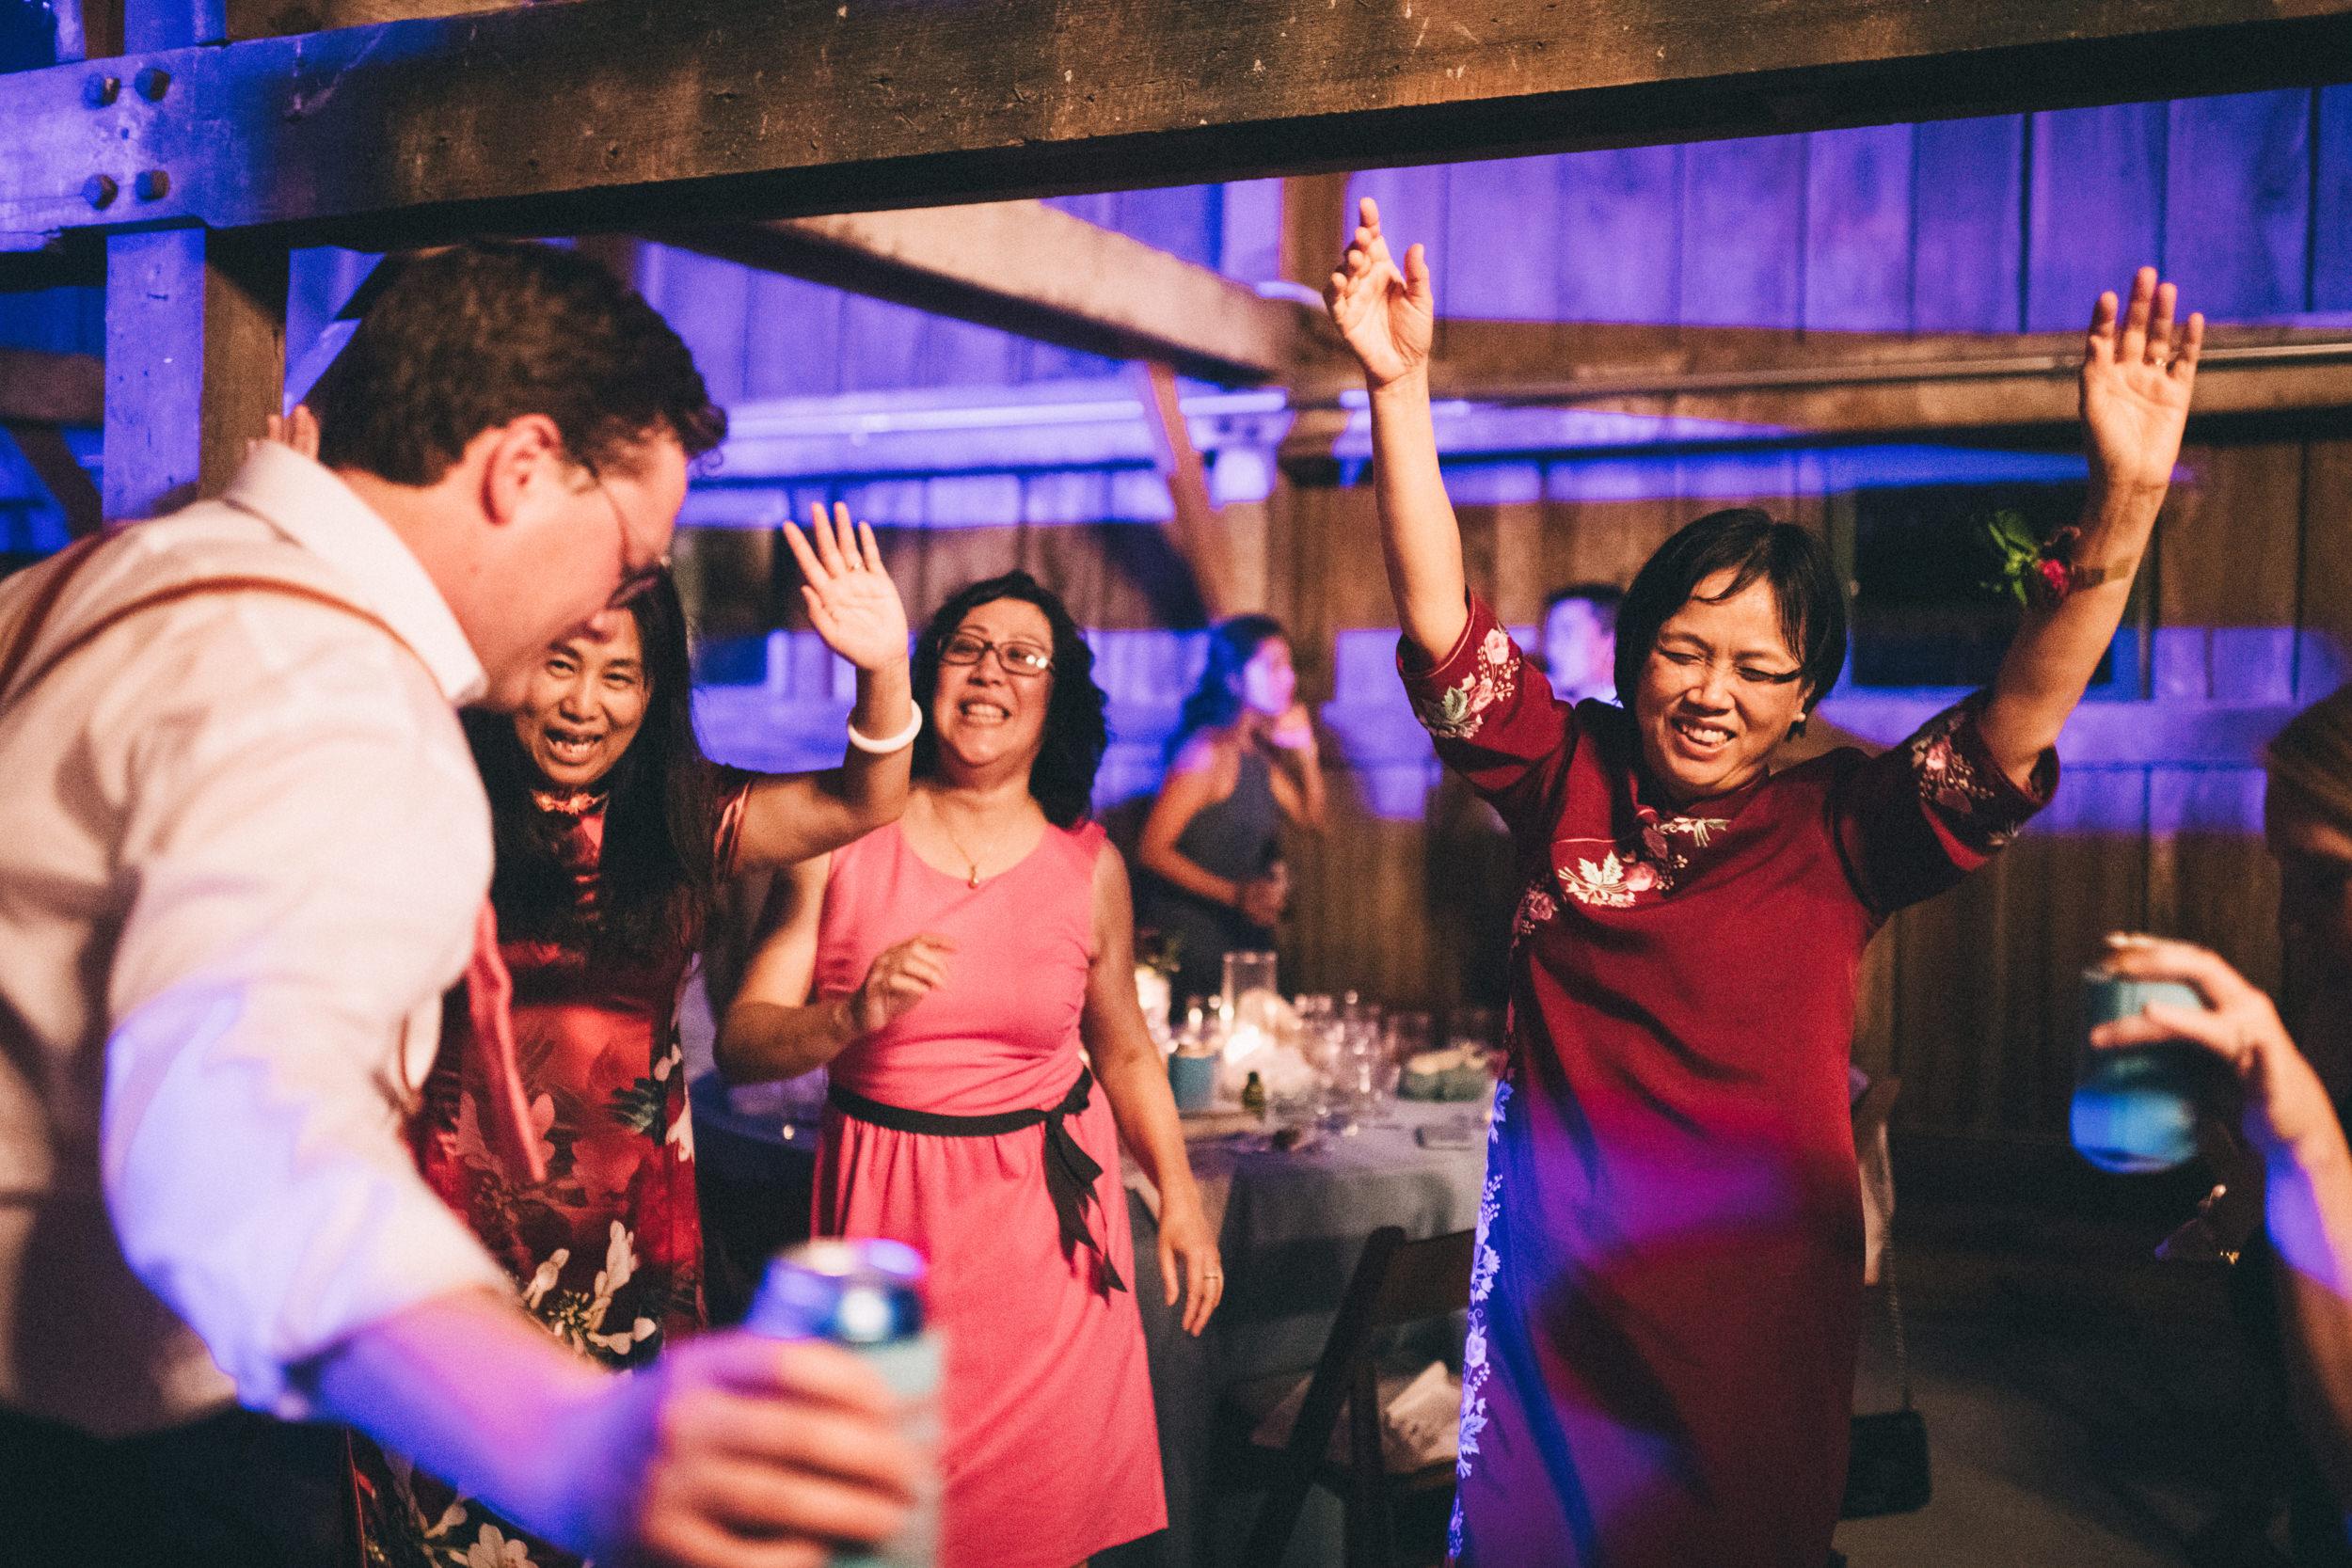 Louisville-Kentucky-Wedding-and-Elopement-Photographer-Sarah-Katherine-Davis-Photography-Summer-Jewel-Toned-Wedding-Chineese-Tea-Ceremony-Warrenwood-Manor-Danville-1080.jpg